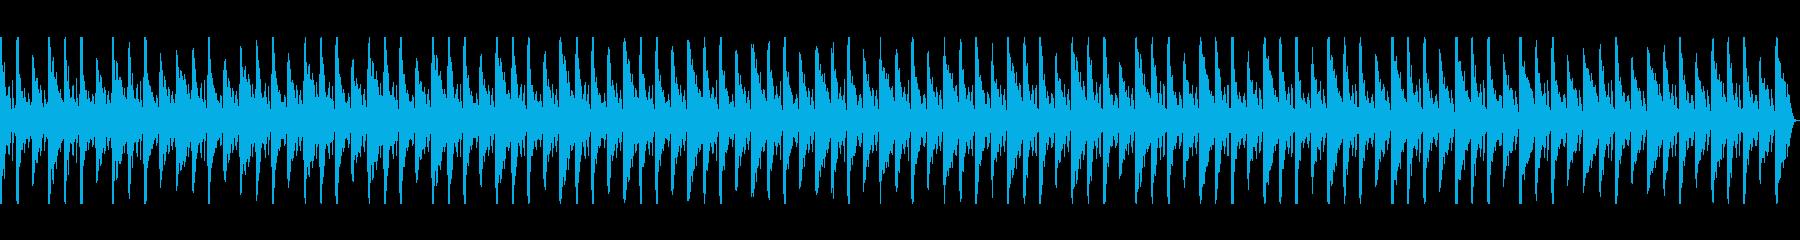 Vtuberの配信 ロマンチック offの再生済みの波形